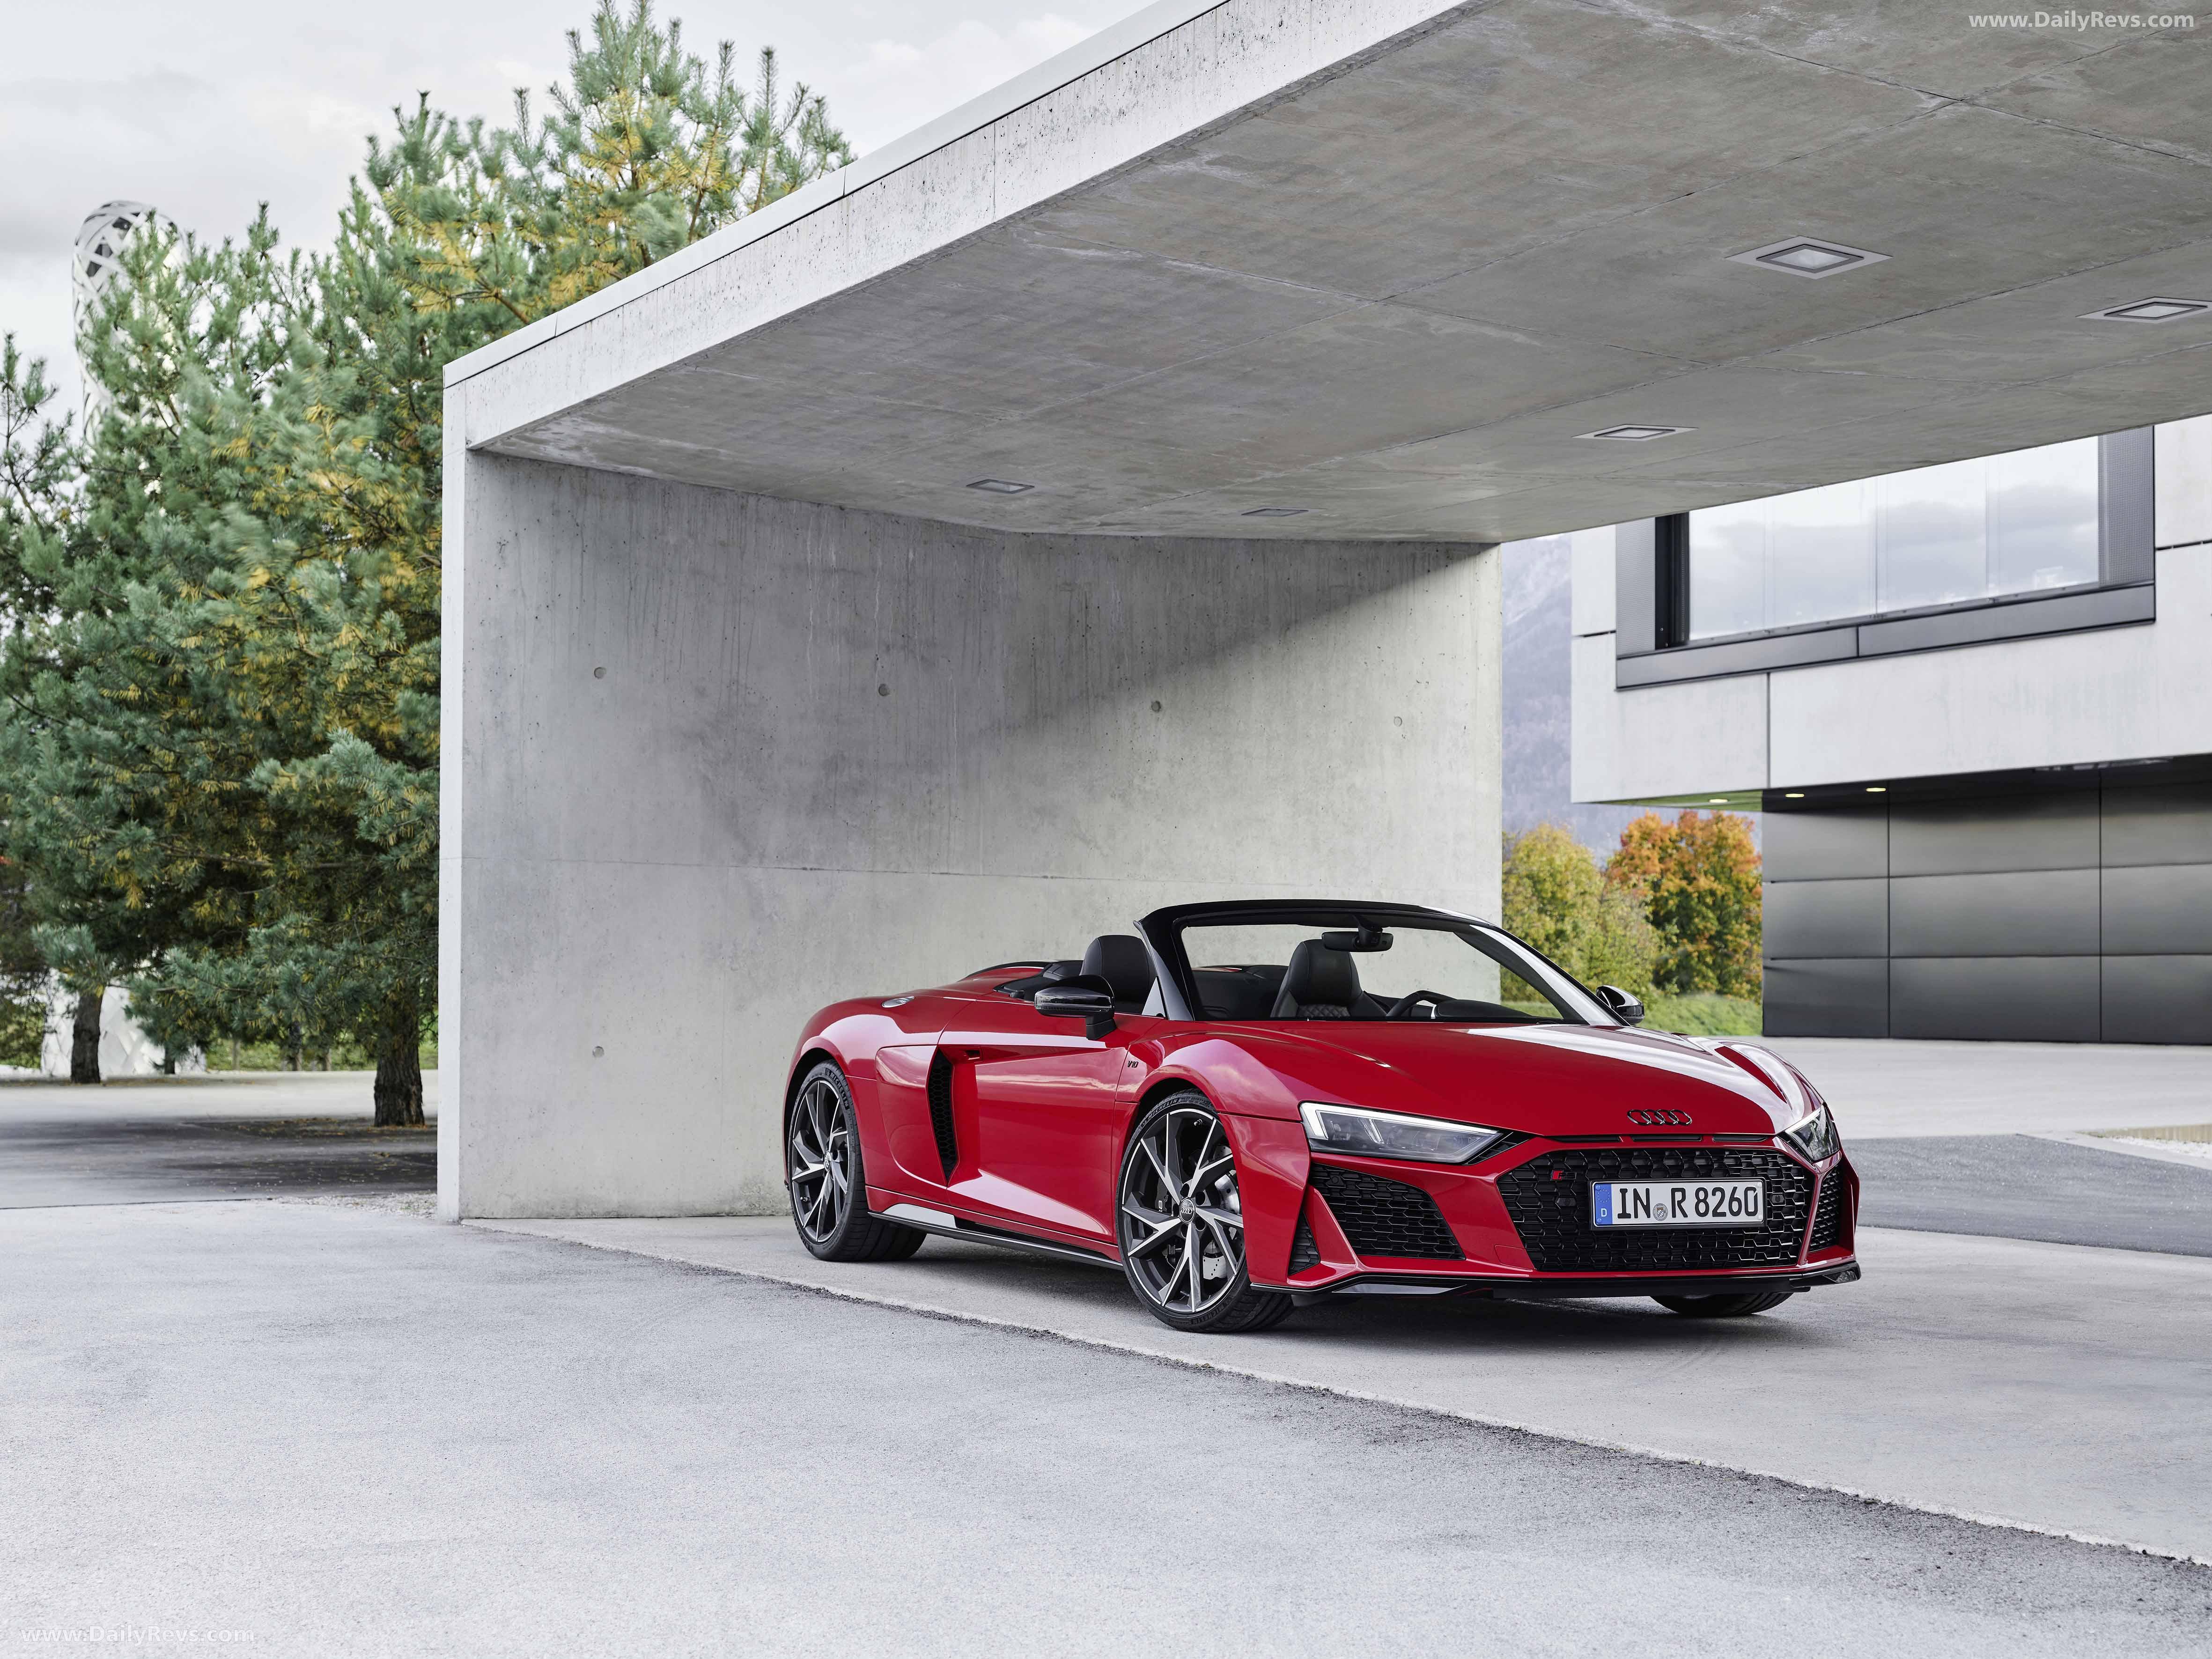 2020 Audi R8 V10 RWD Spyder - Pictures, Images, Photos ...